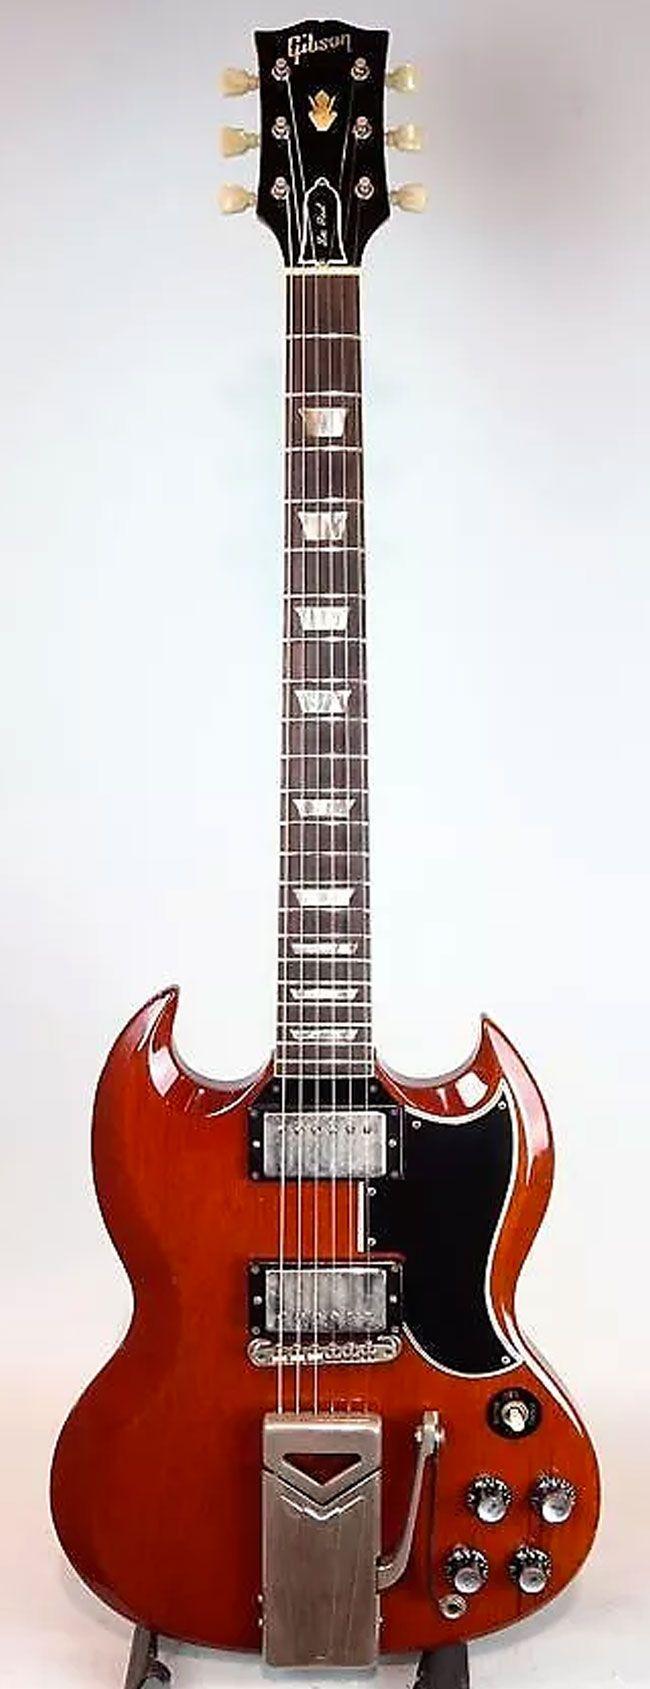 1962 Les Paul/SG Standard